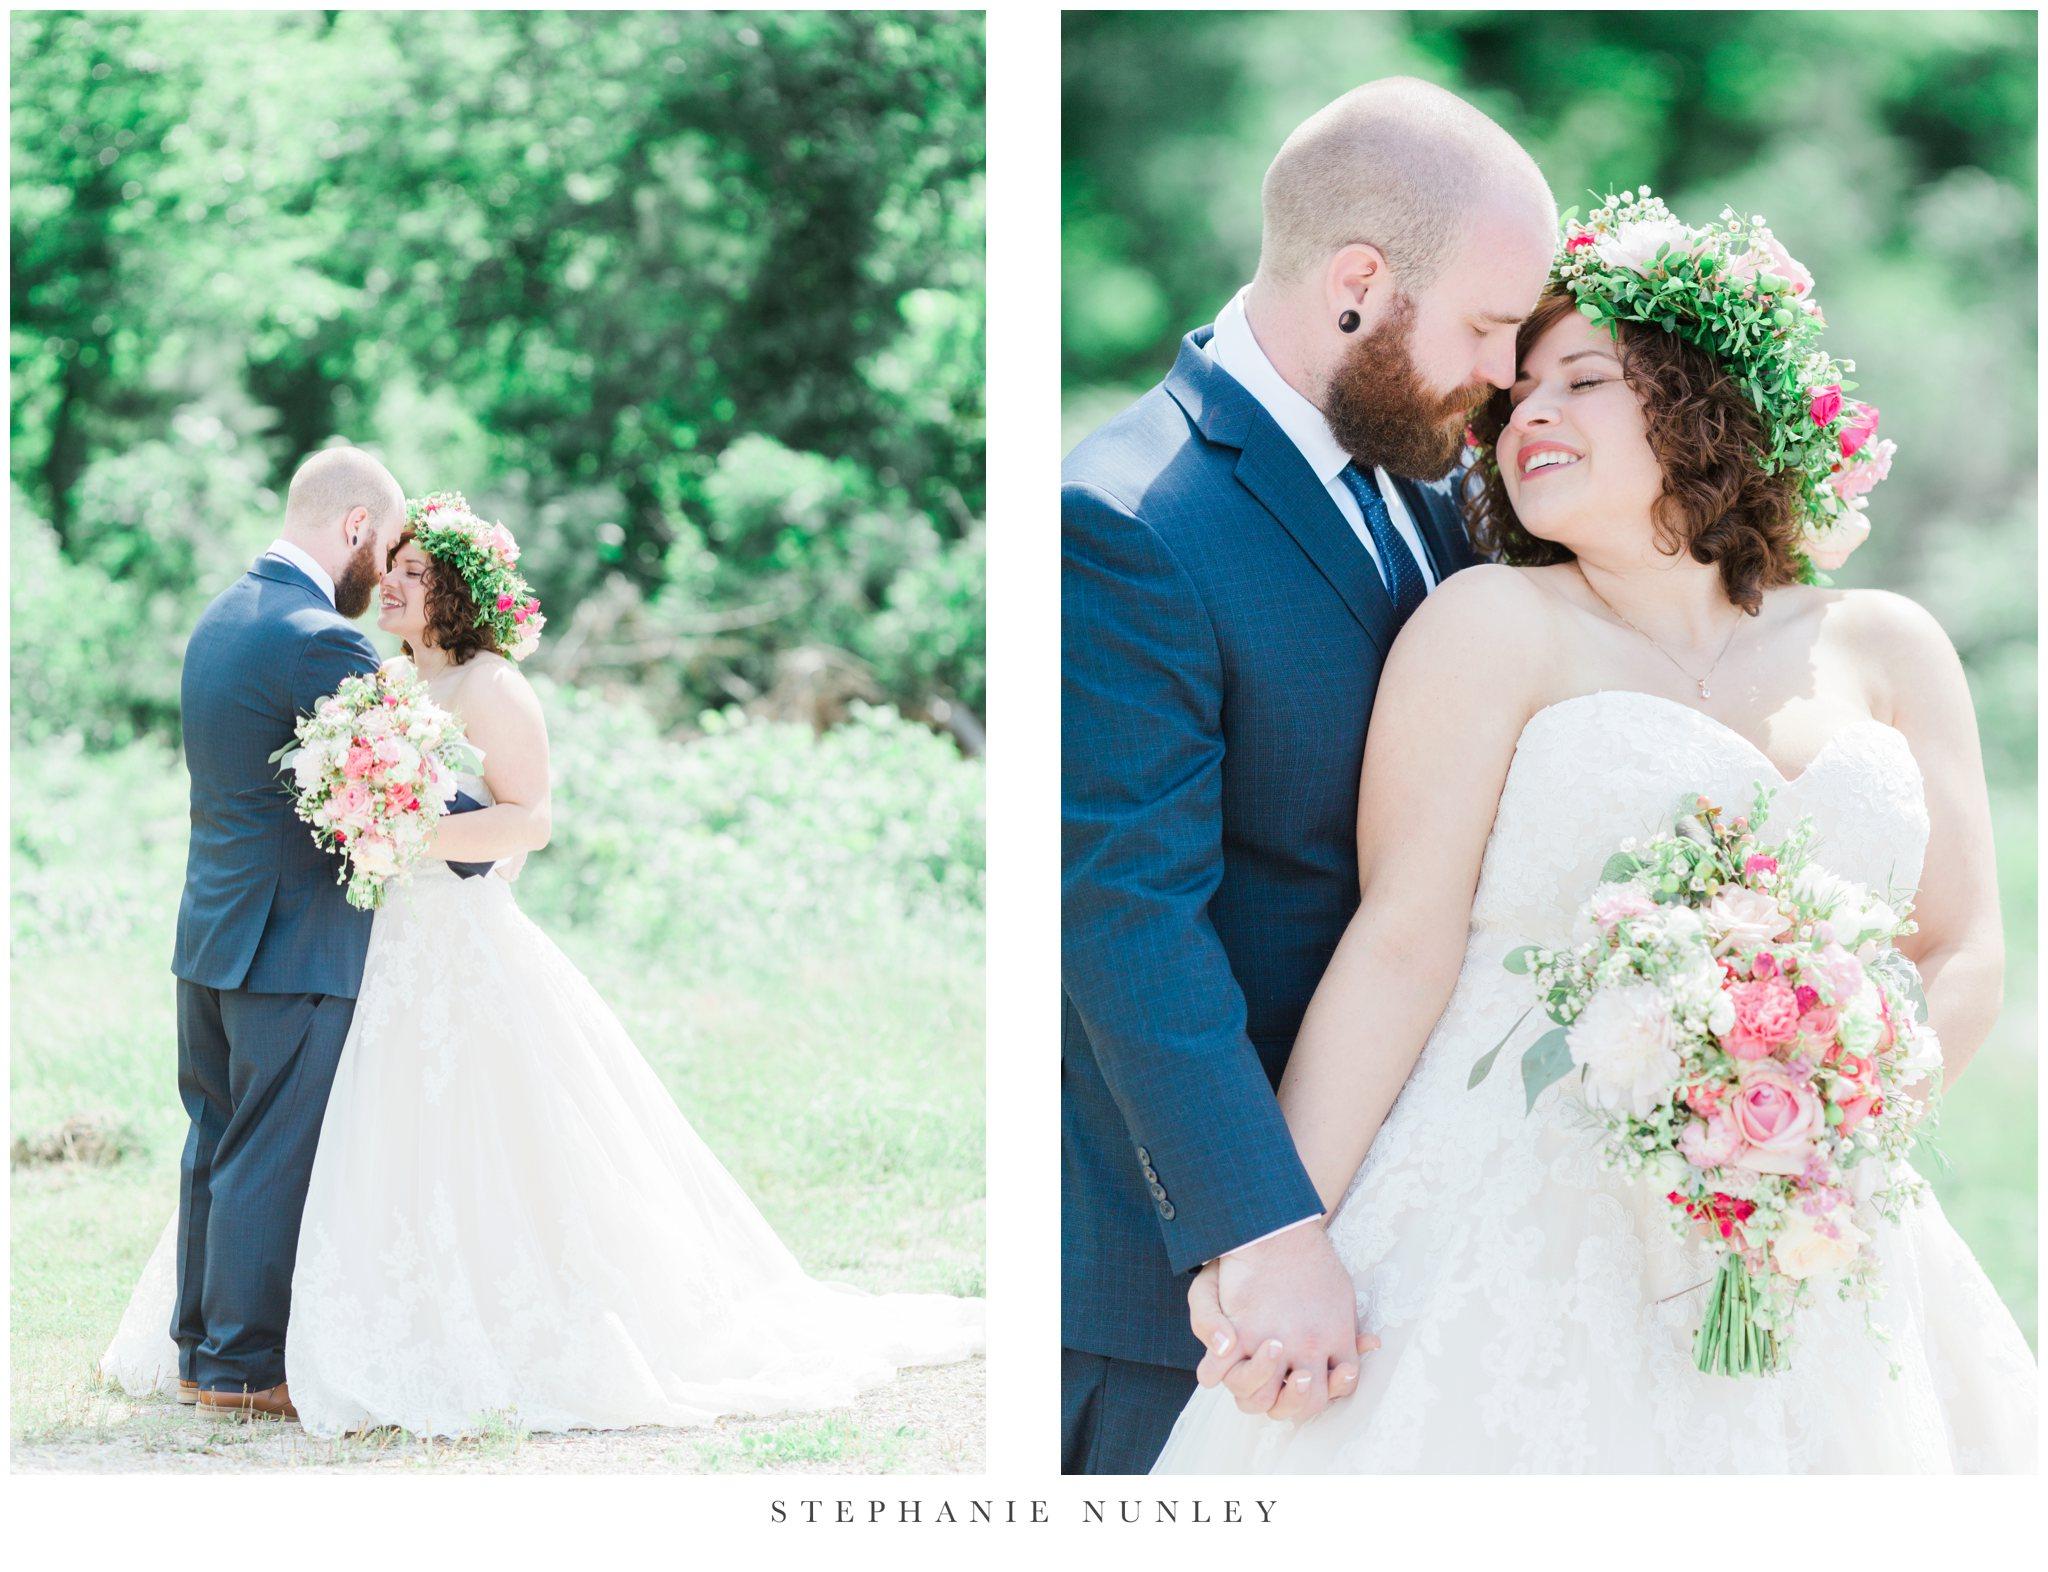 romantic-outdoor-wedding-with-flower-crown-0038.jpg